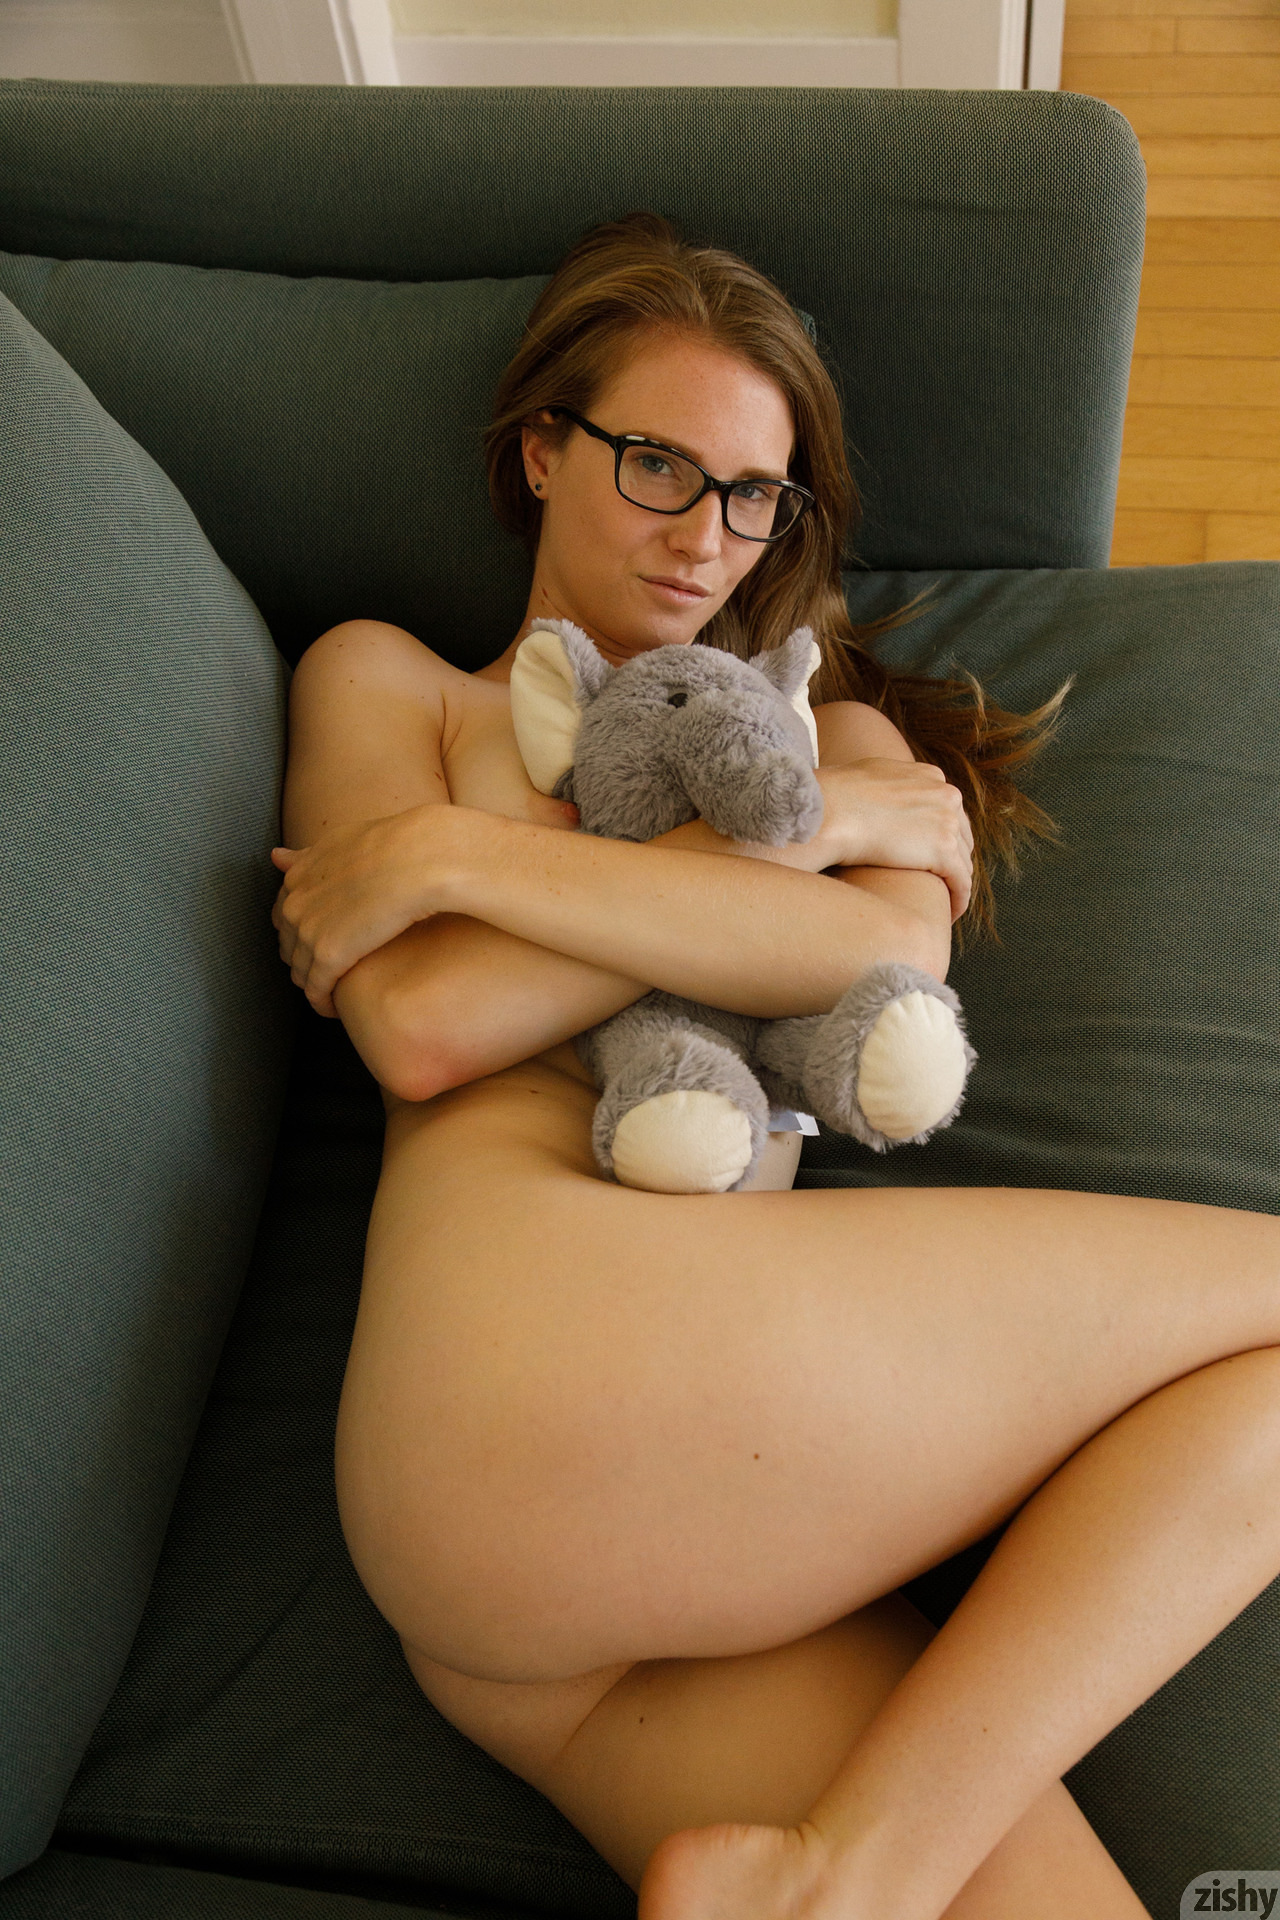 Ashley Lane Everyday People Zishy (34)